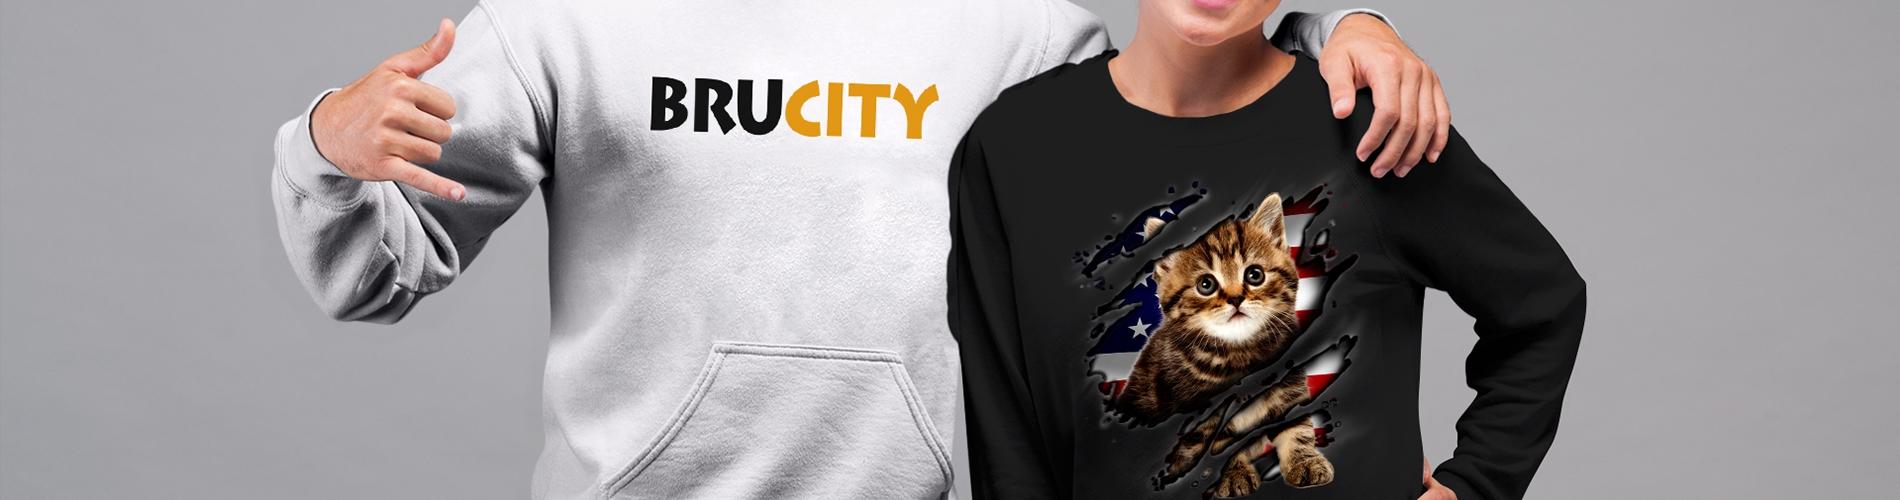 brucity (@brucity) Cover Image